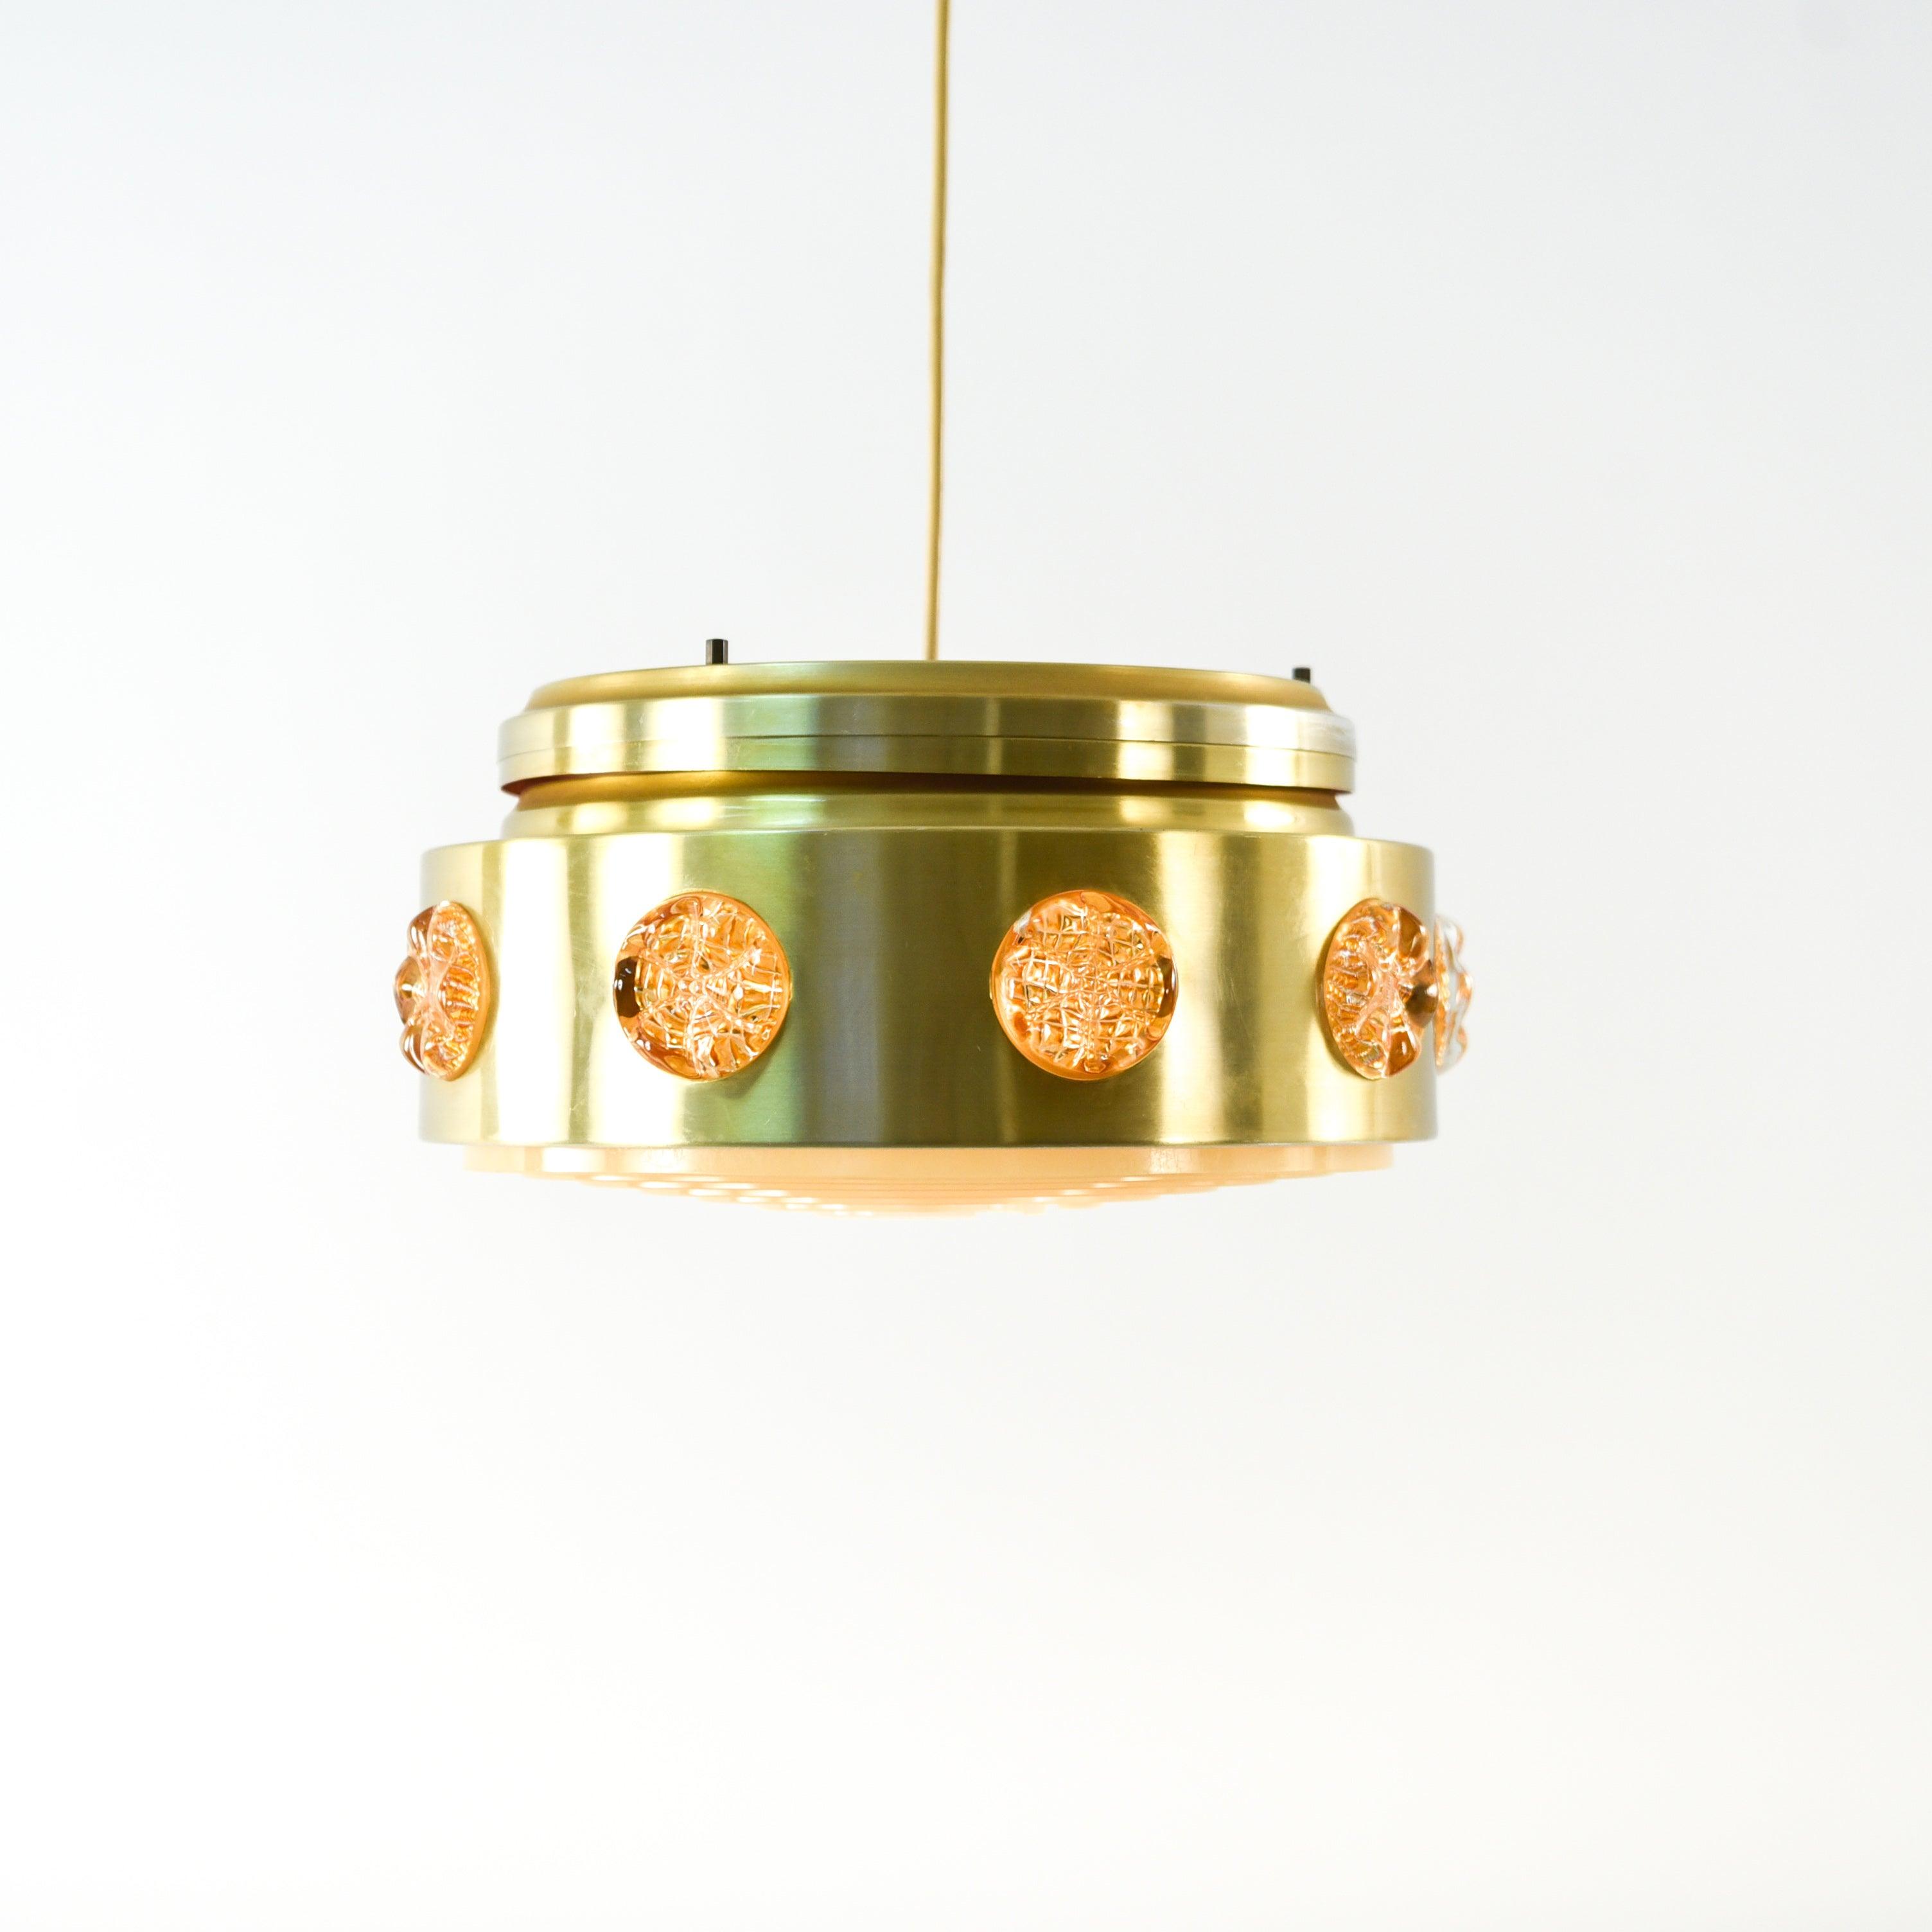 Danish Midcentury Pendant Light For Sale At 1stdibs